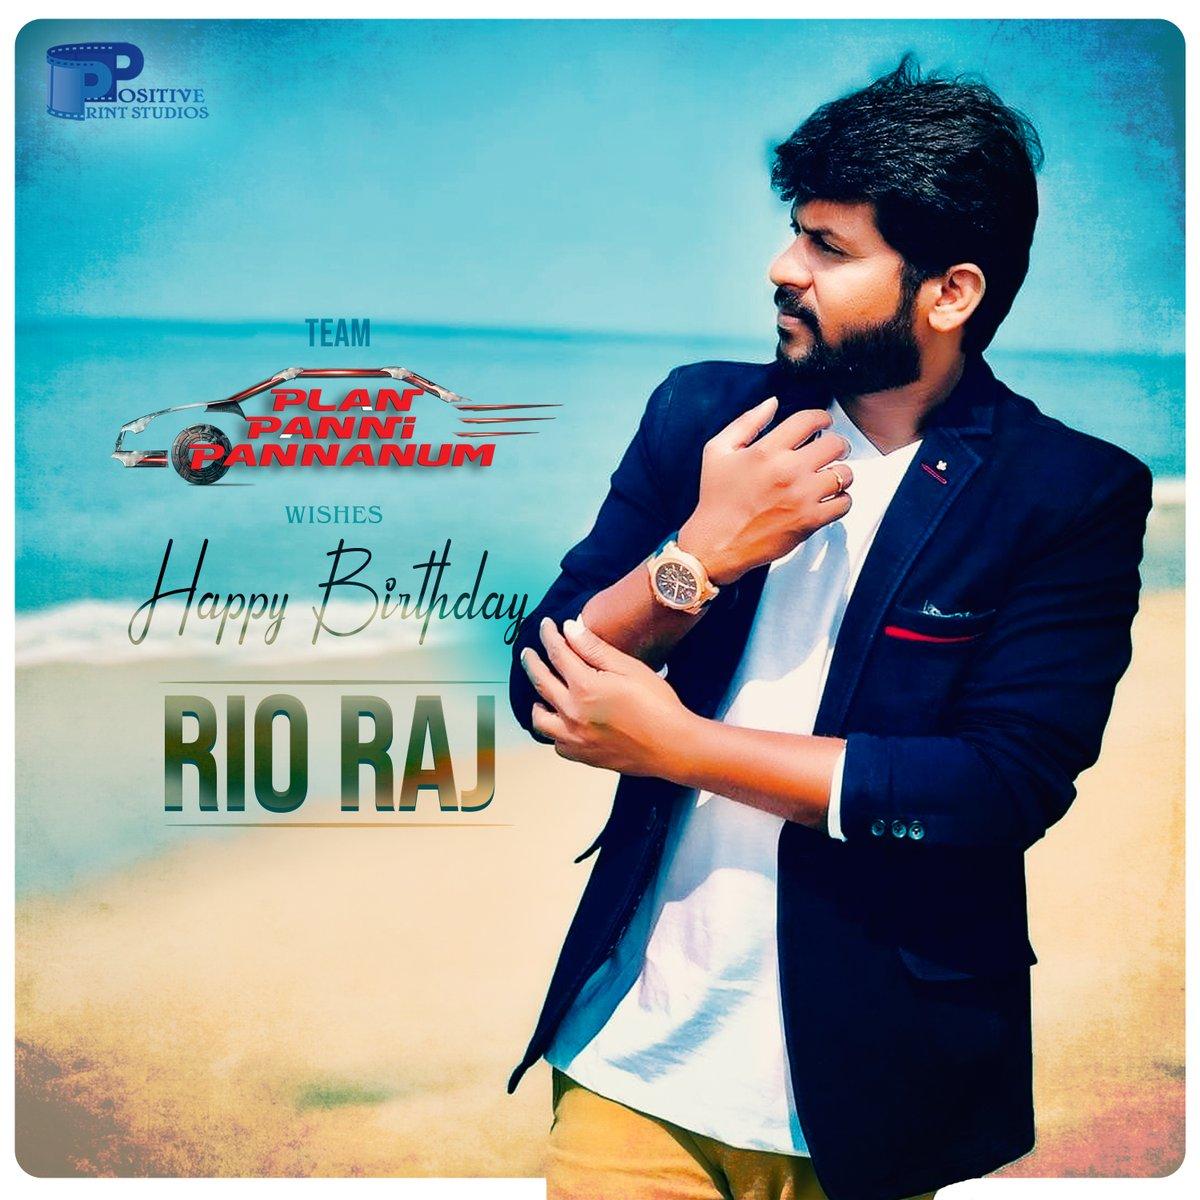 We wish our 'Hero' @rio_raj a very happy birthday! Had the best time working with you. Ivlo formal ah birthday wish pannitom. Aduthu #PlanPanniPannanum!😍  #HBDRioRaj #HBDRio #YuvanBadri3